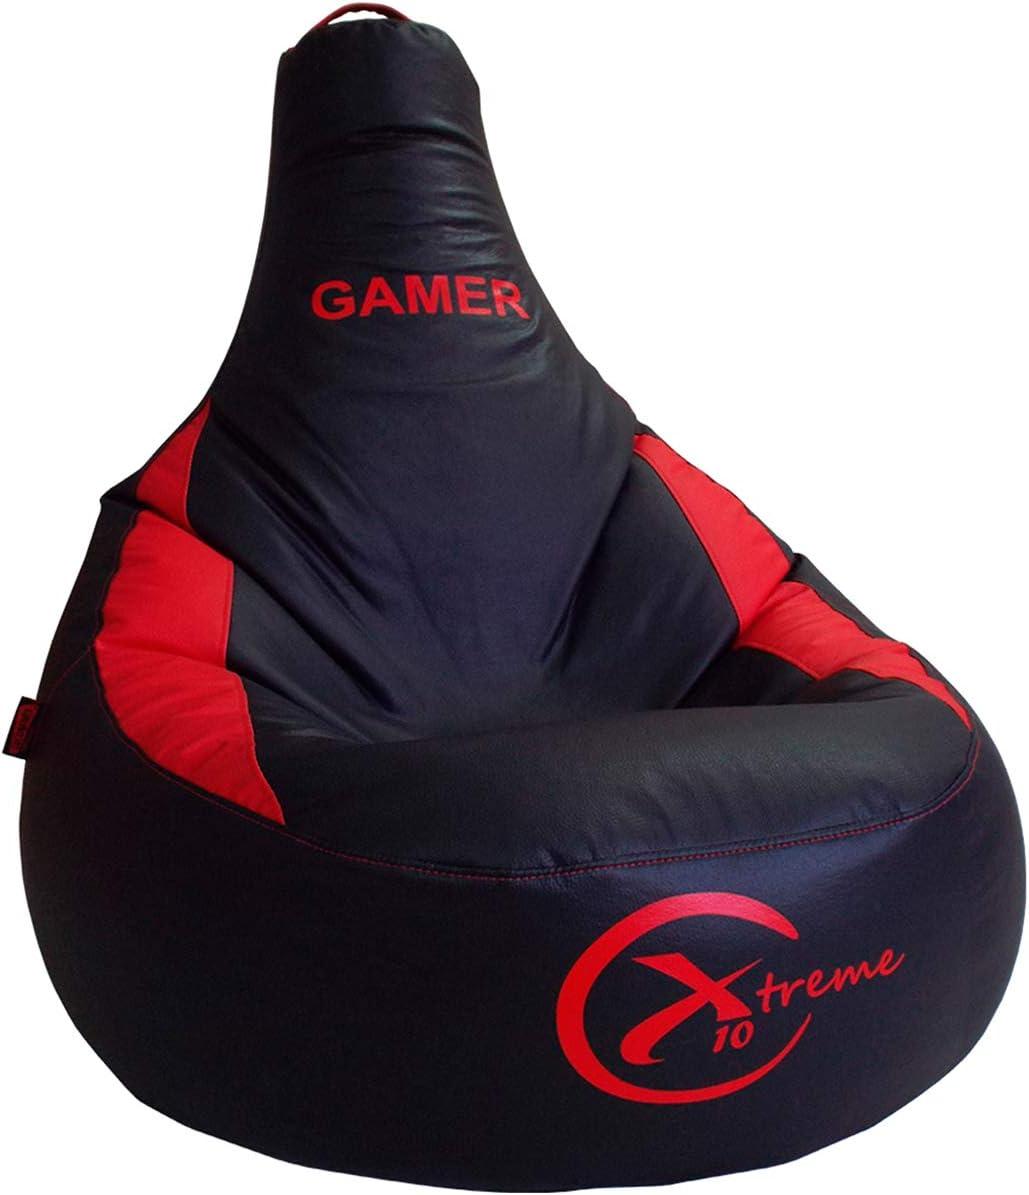 loconfort Nuevo!! Puff Gamer X10 Extreme - Puff XL - Polipiel - Especial Juegos Playstation, Xbox, Wii etc. (XL, Rojo)